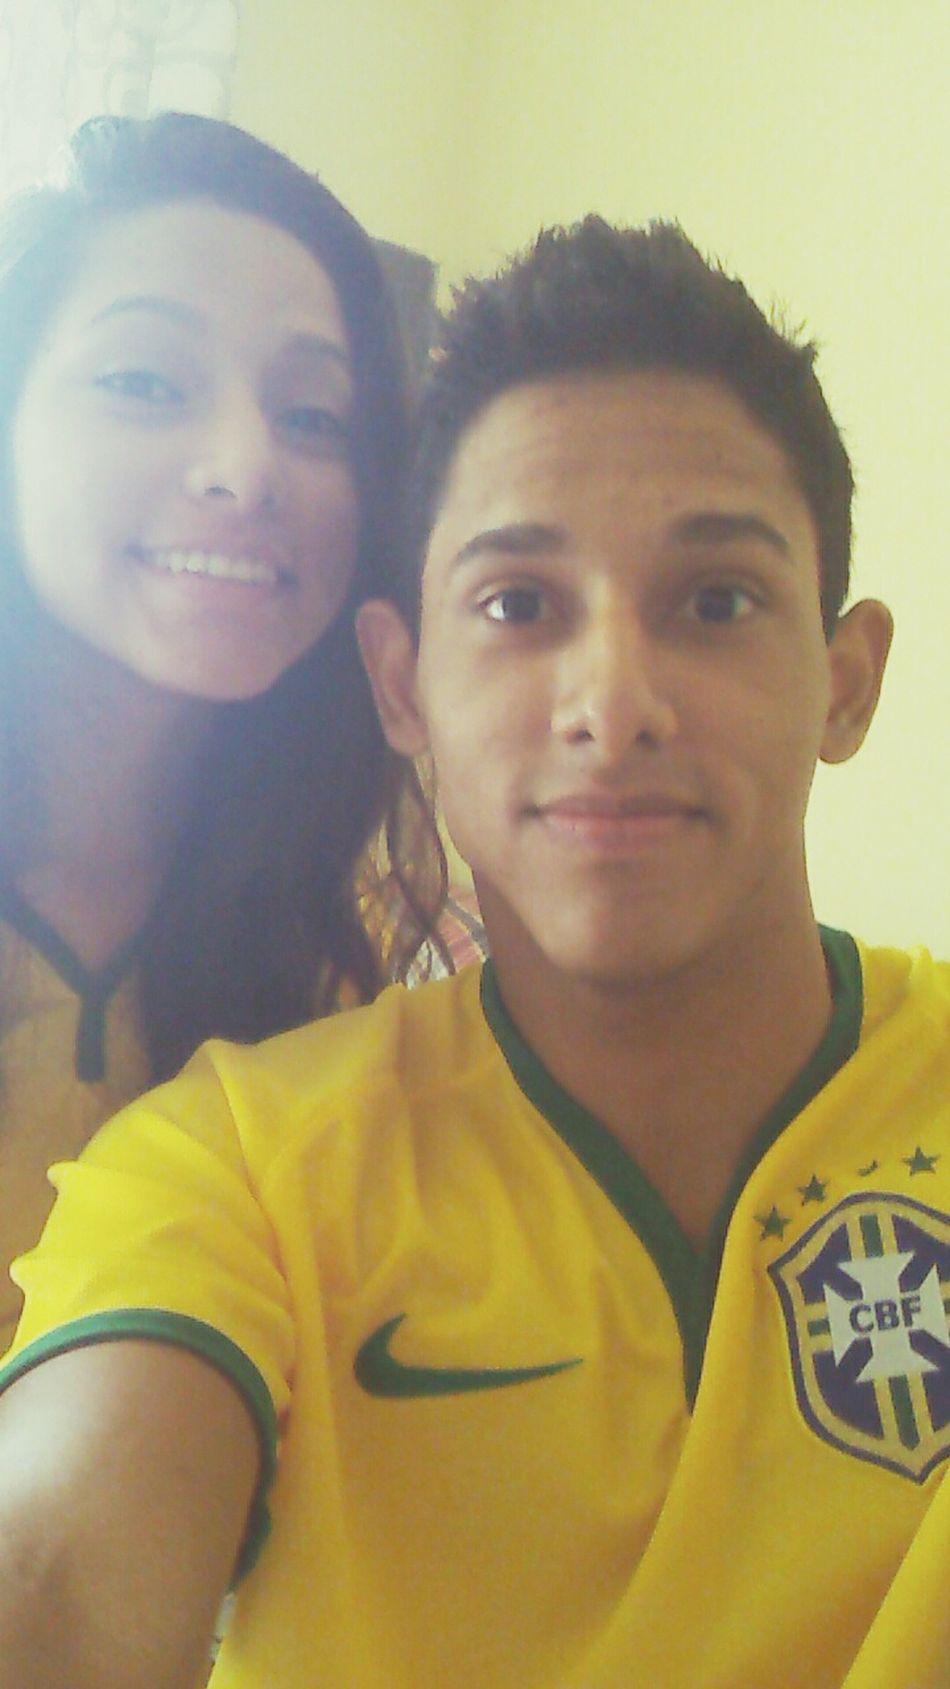 Mostra tua força Brasil !